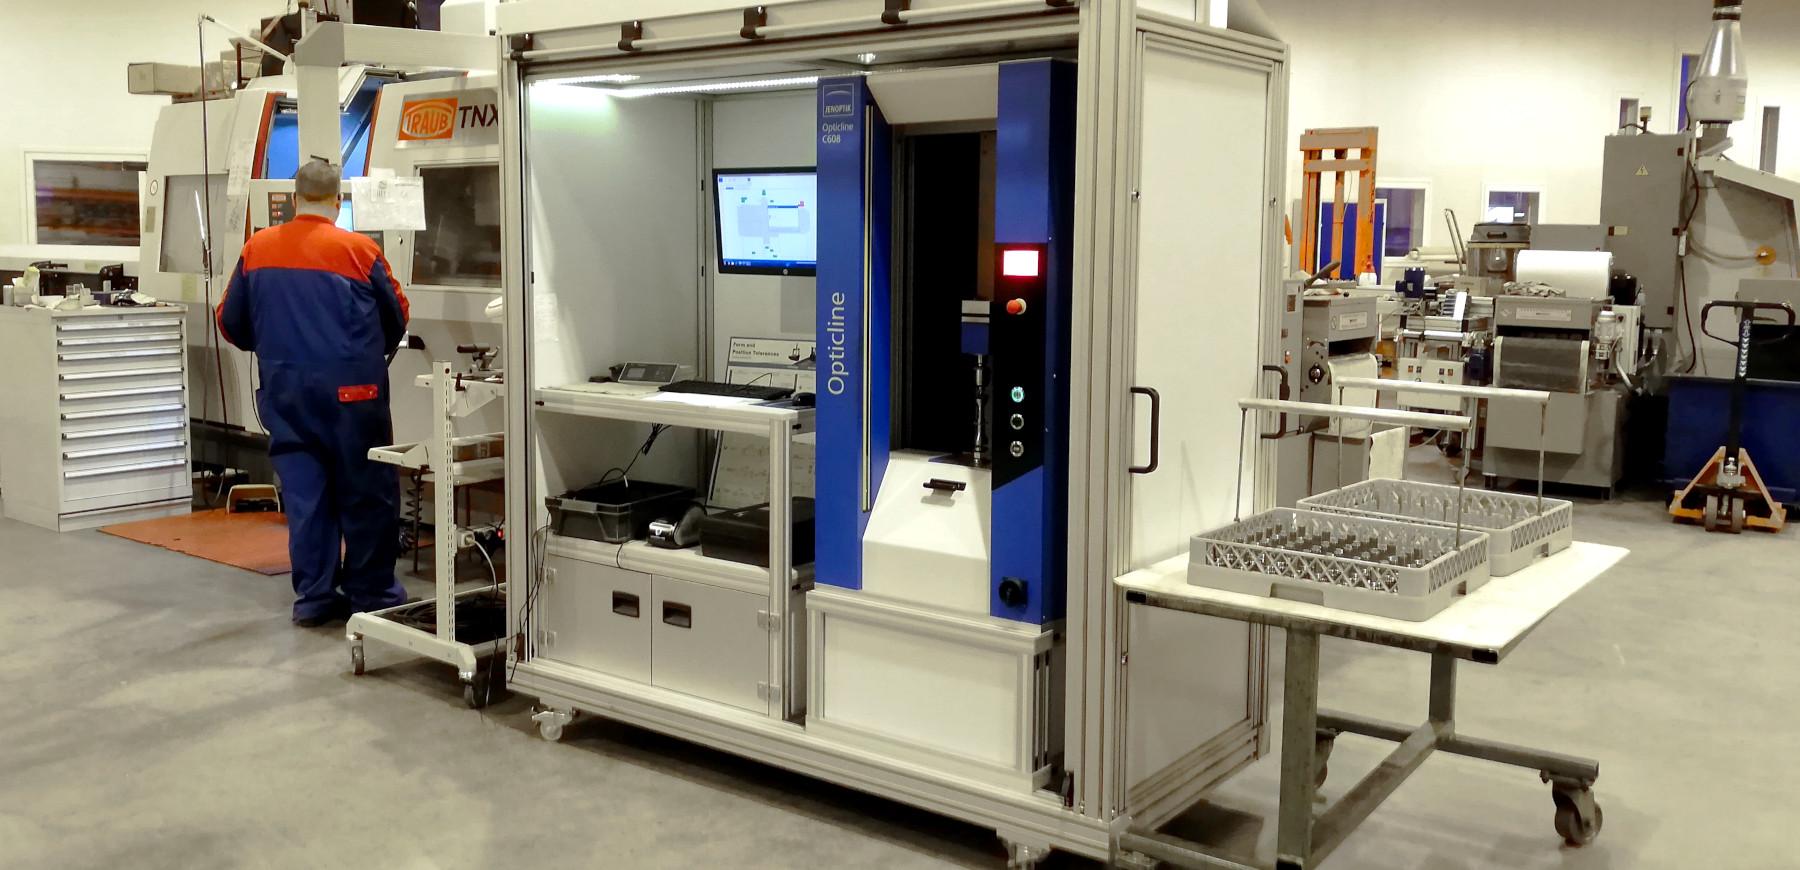 Koneistuspalvelut, CNC-koneistus